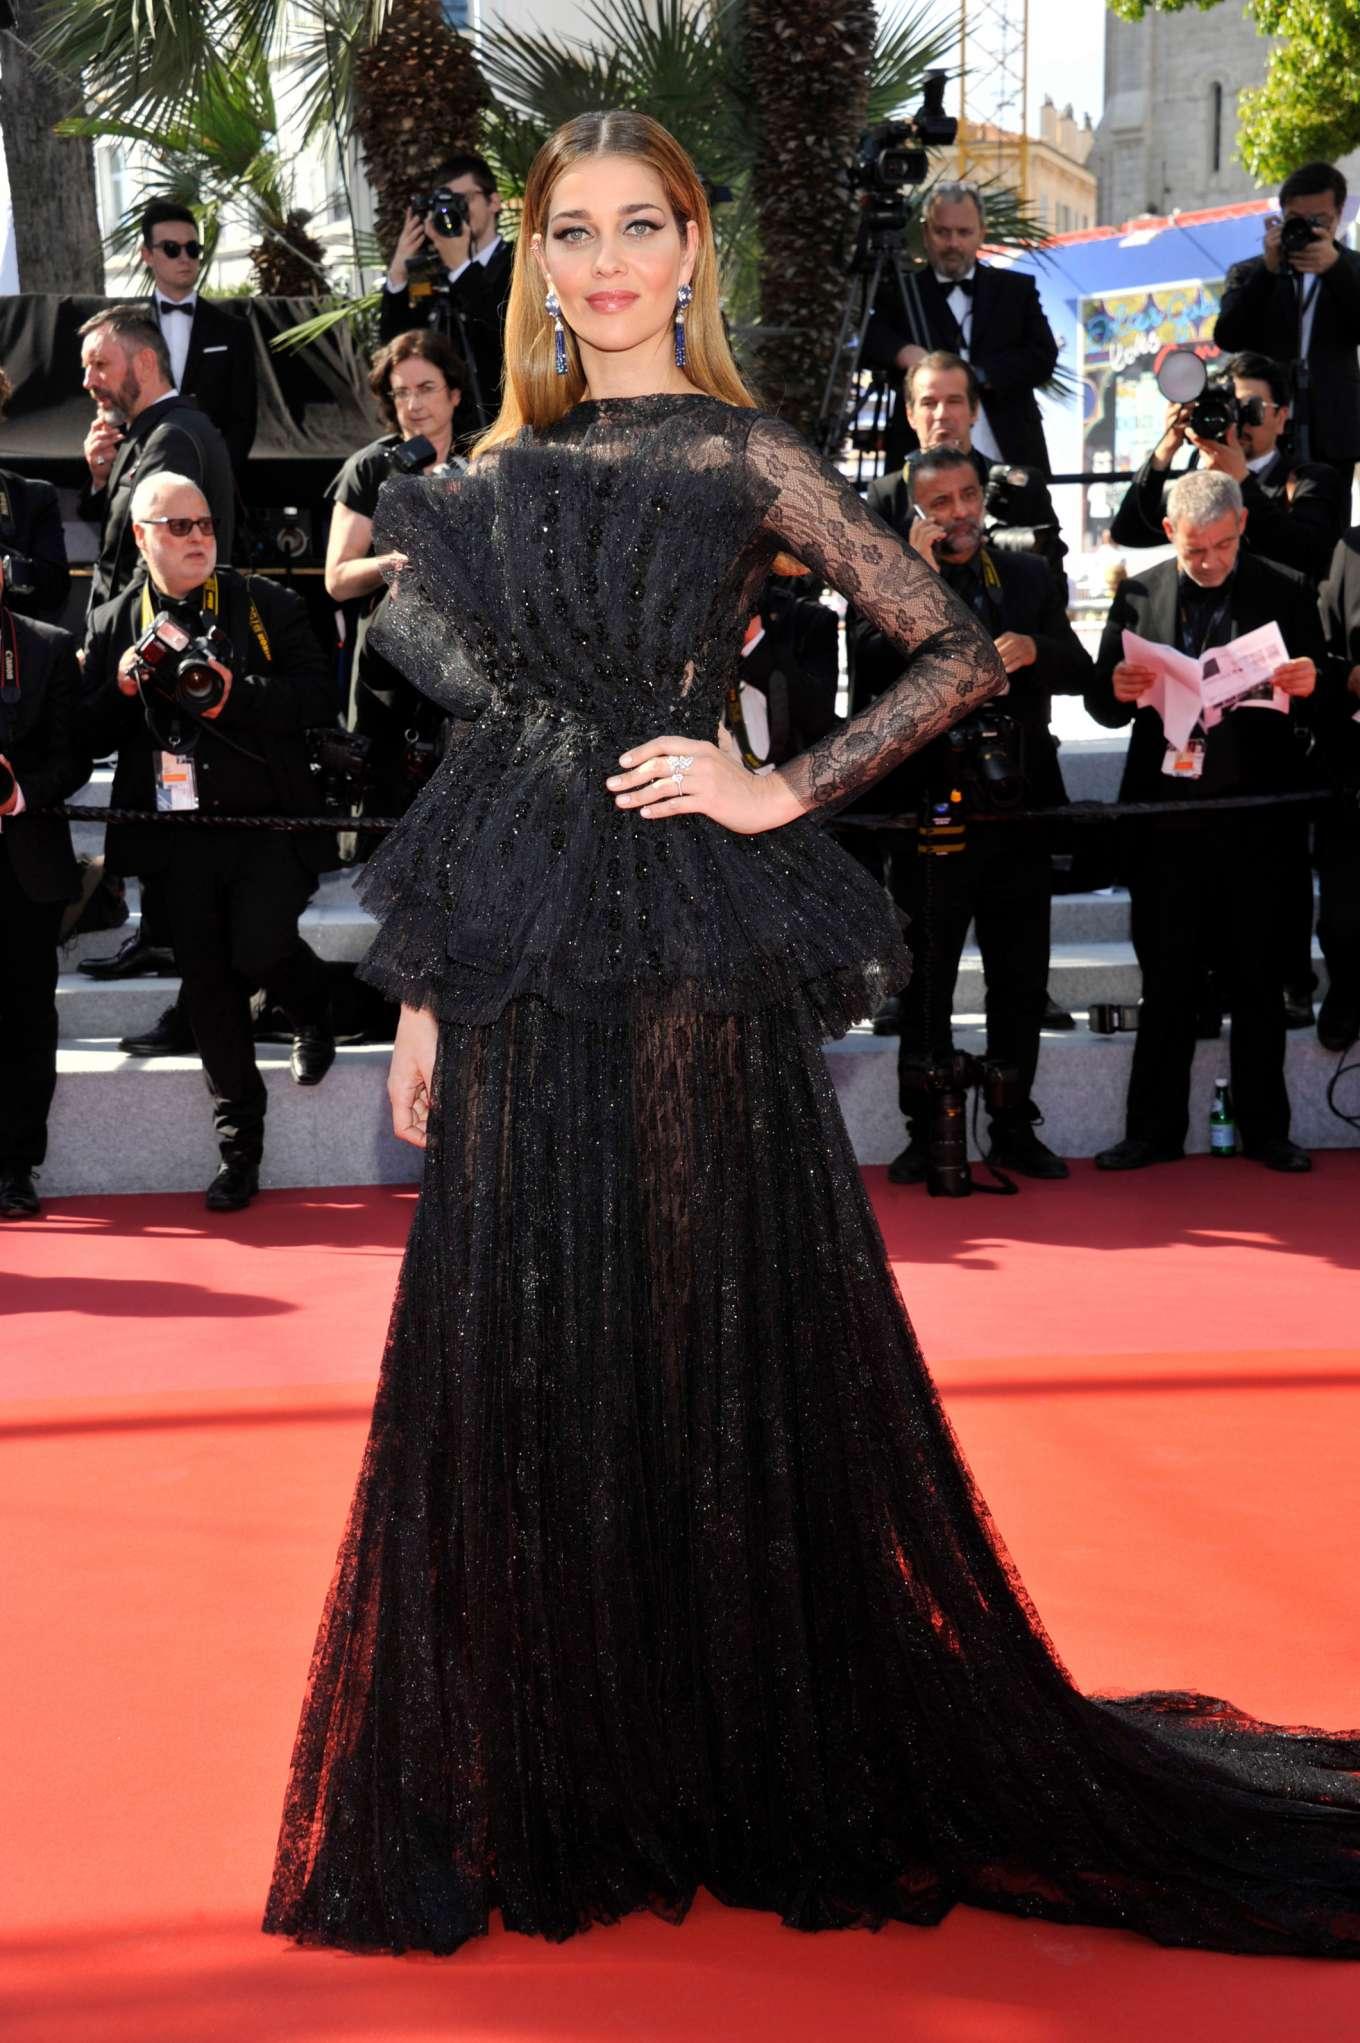 Ana Beatriz Barros 2019 : Ana Beatriz Barros: The Traitor Premiere at 2019 Cannes Film Festival-11